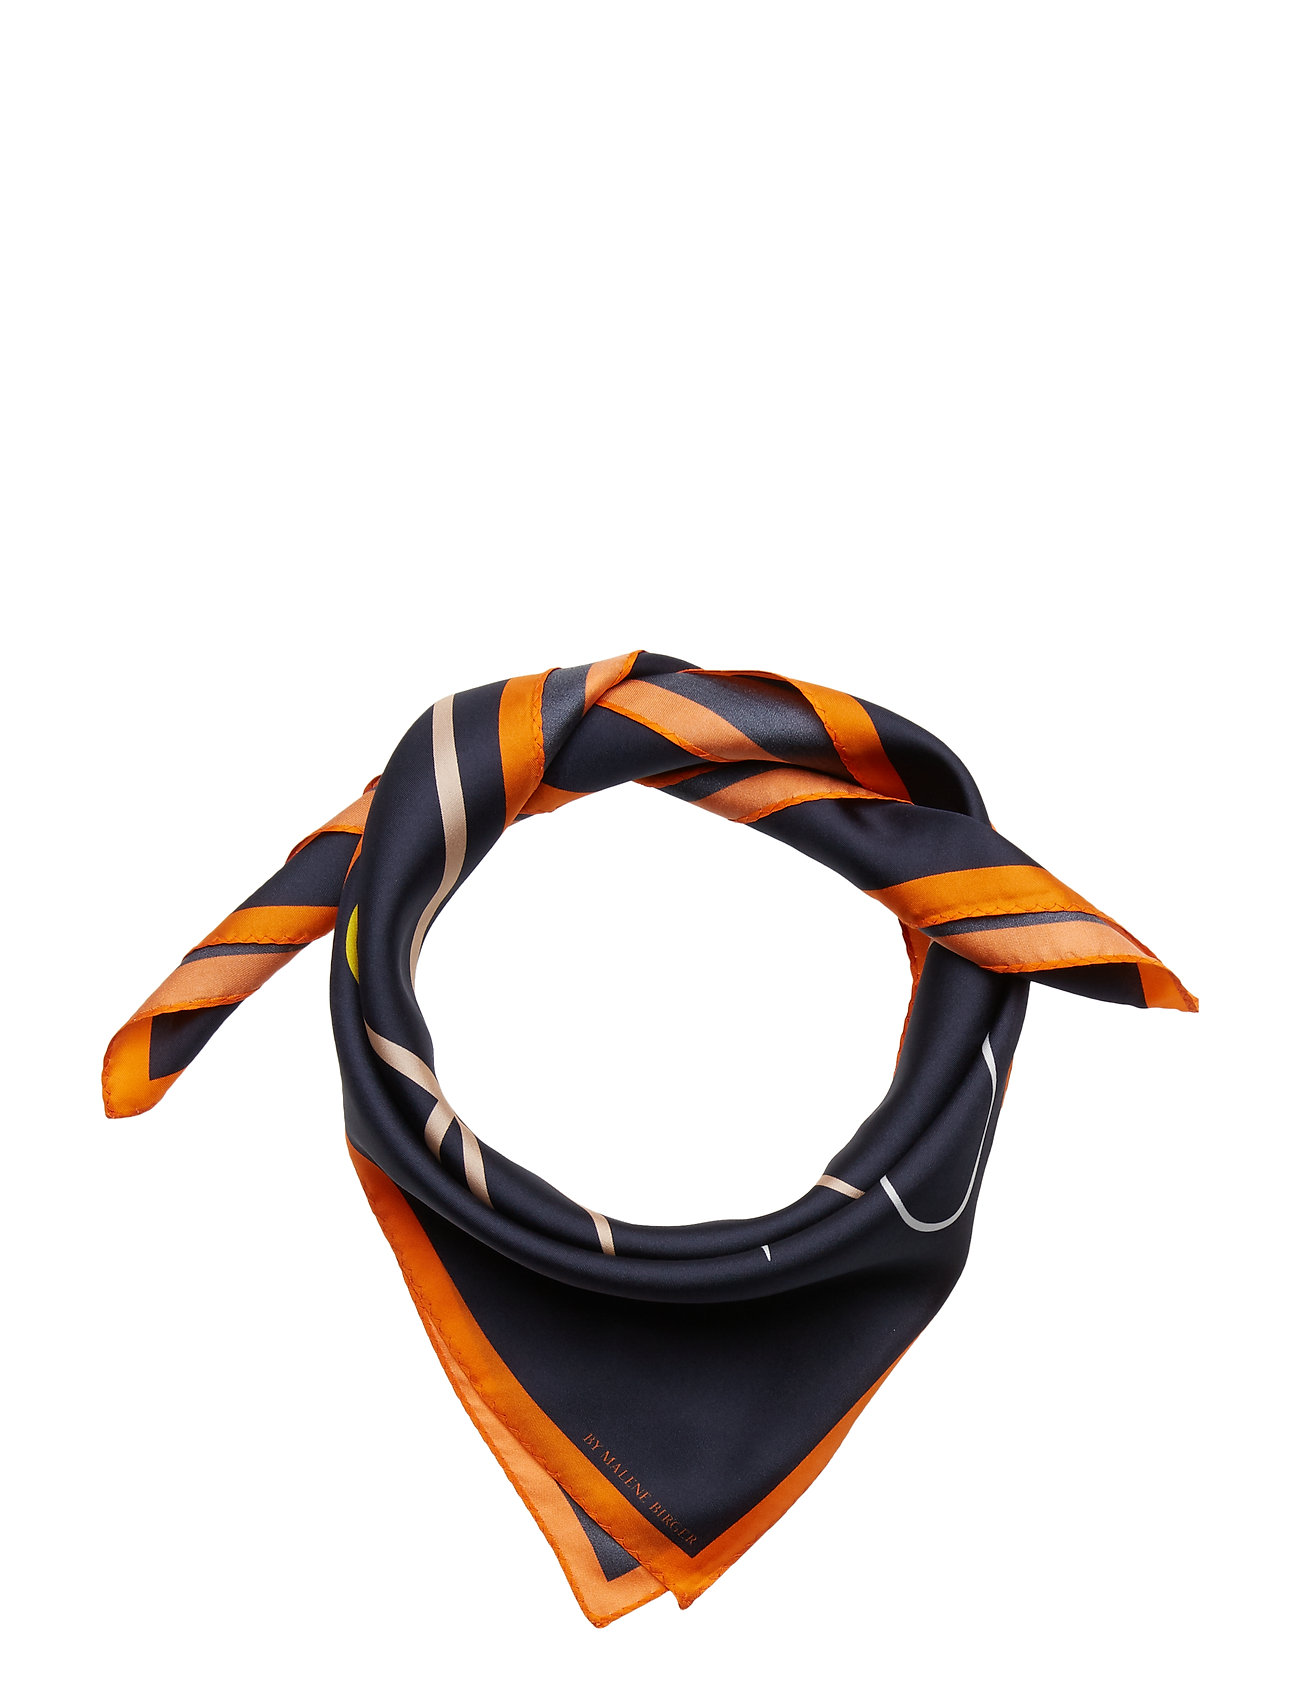 Image of Sca7008s91 Tørklæde Orange BY MALENE BIRGER (3132348909)